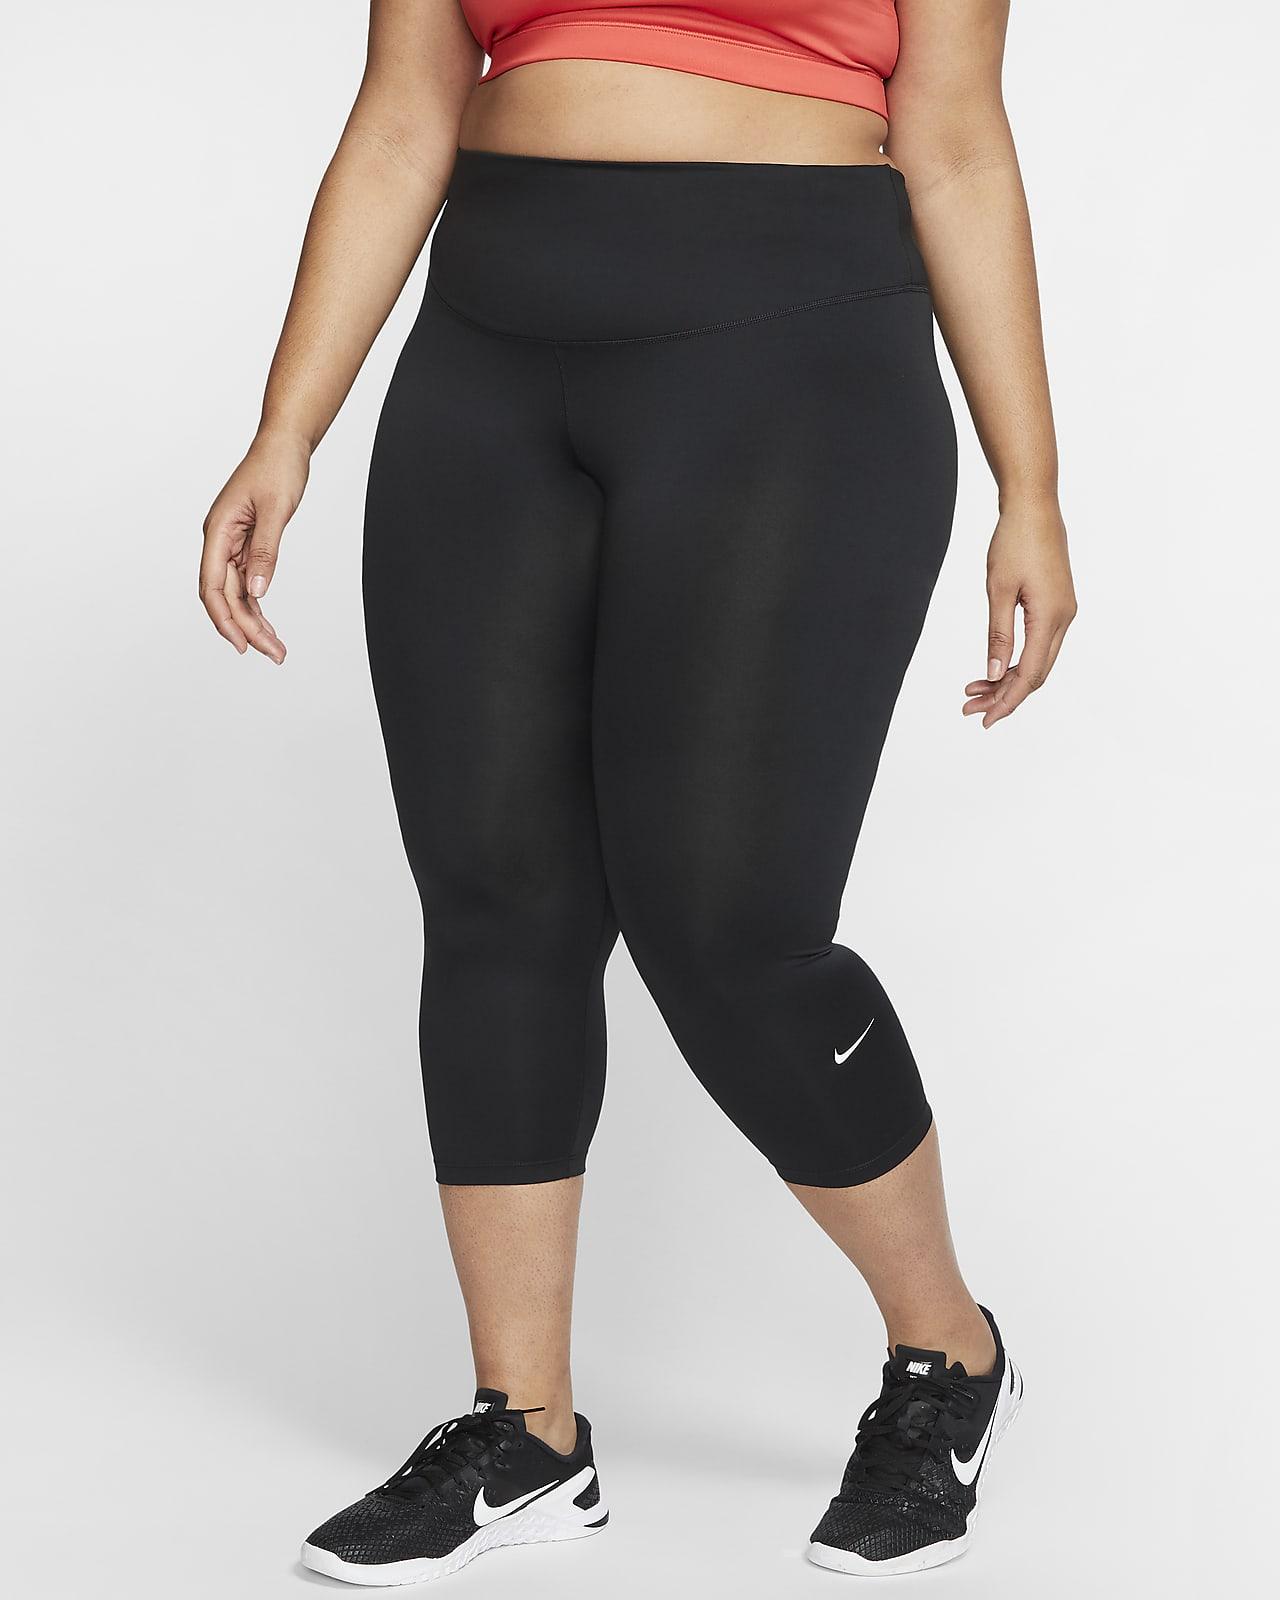 Legging court taille mi-haute Nike One pour Femme (grande taille)